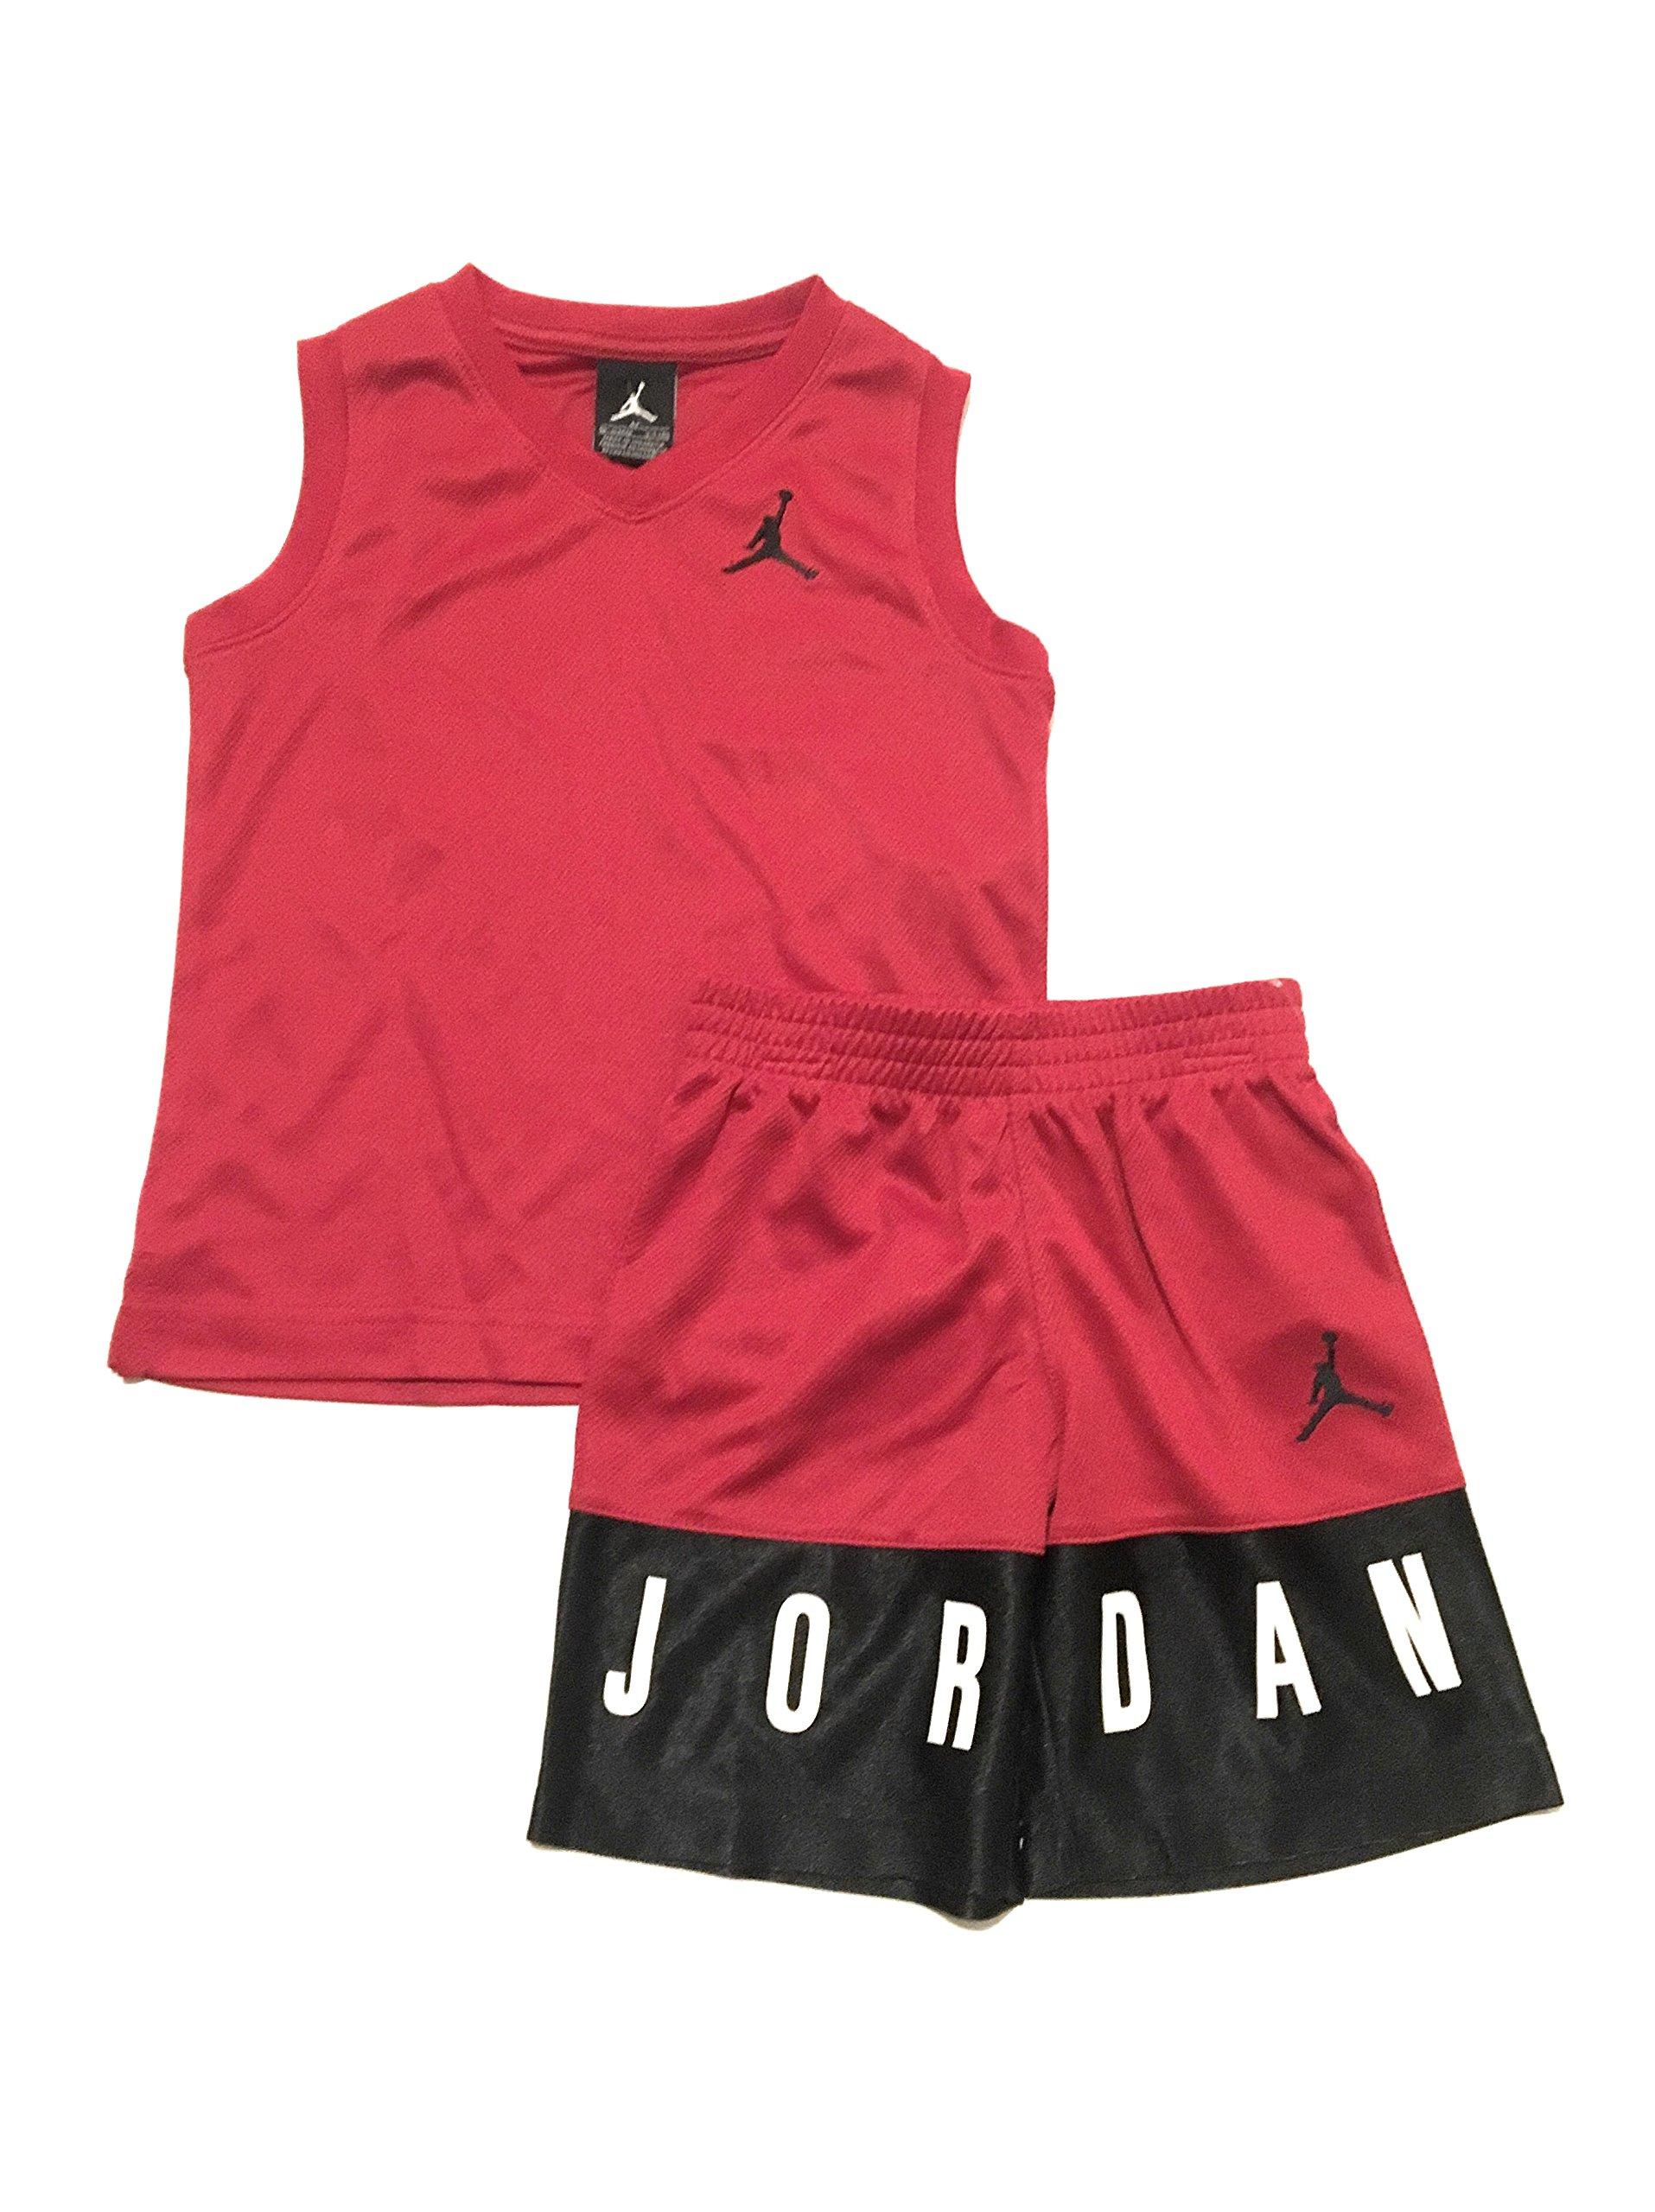 Jordan Jumpman 23 Logo Tank Top and Shorts Set, Gym Red, 4T